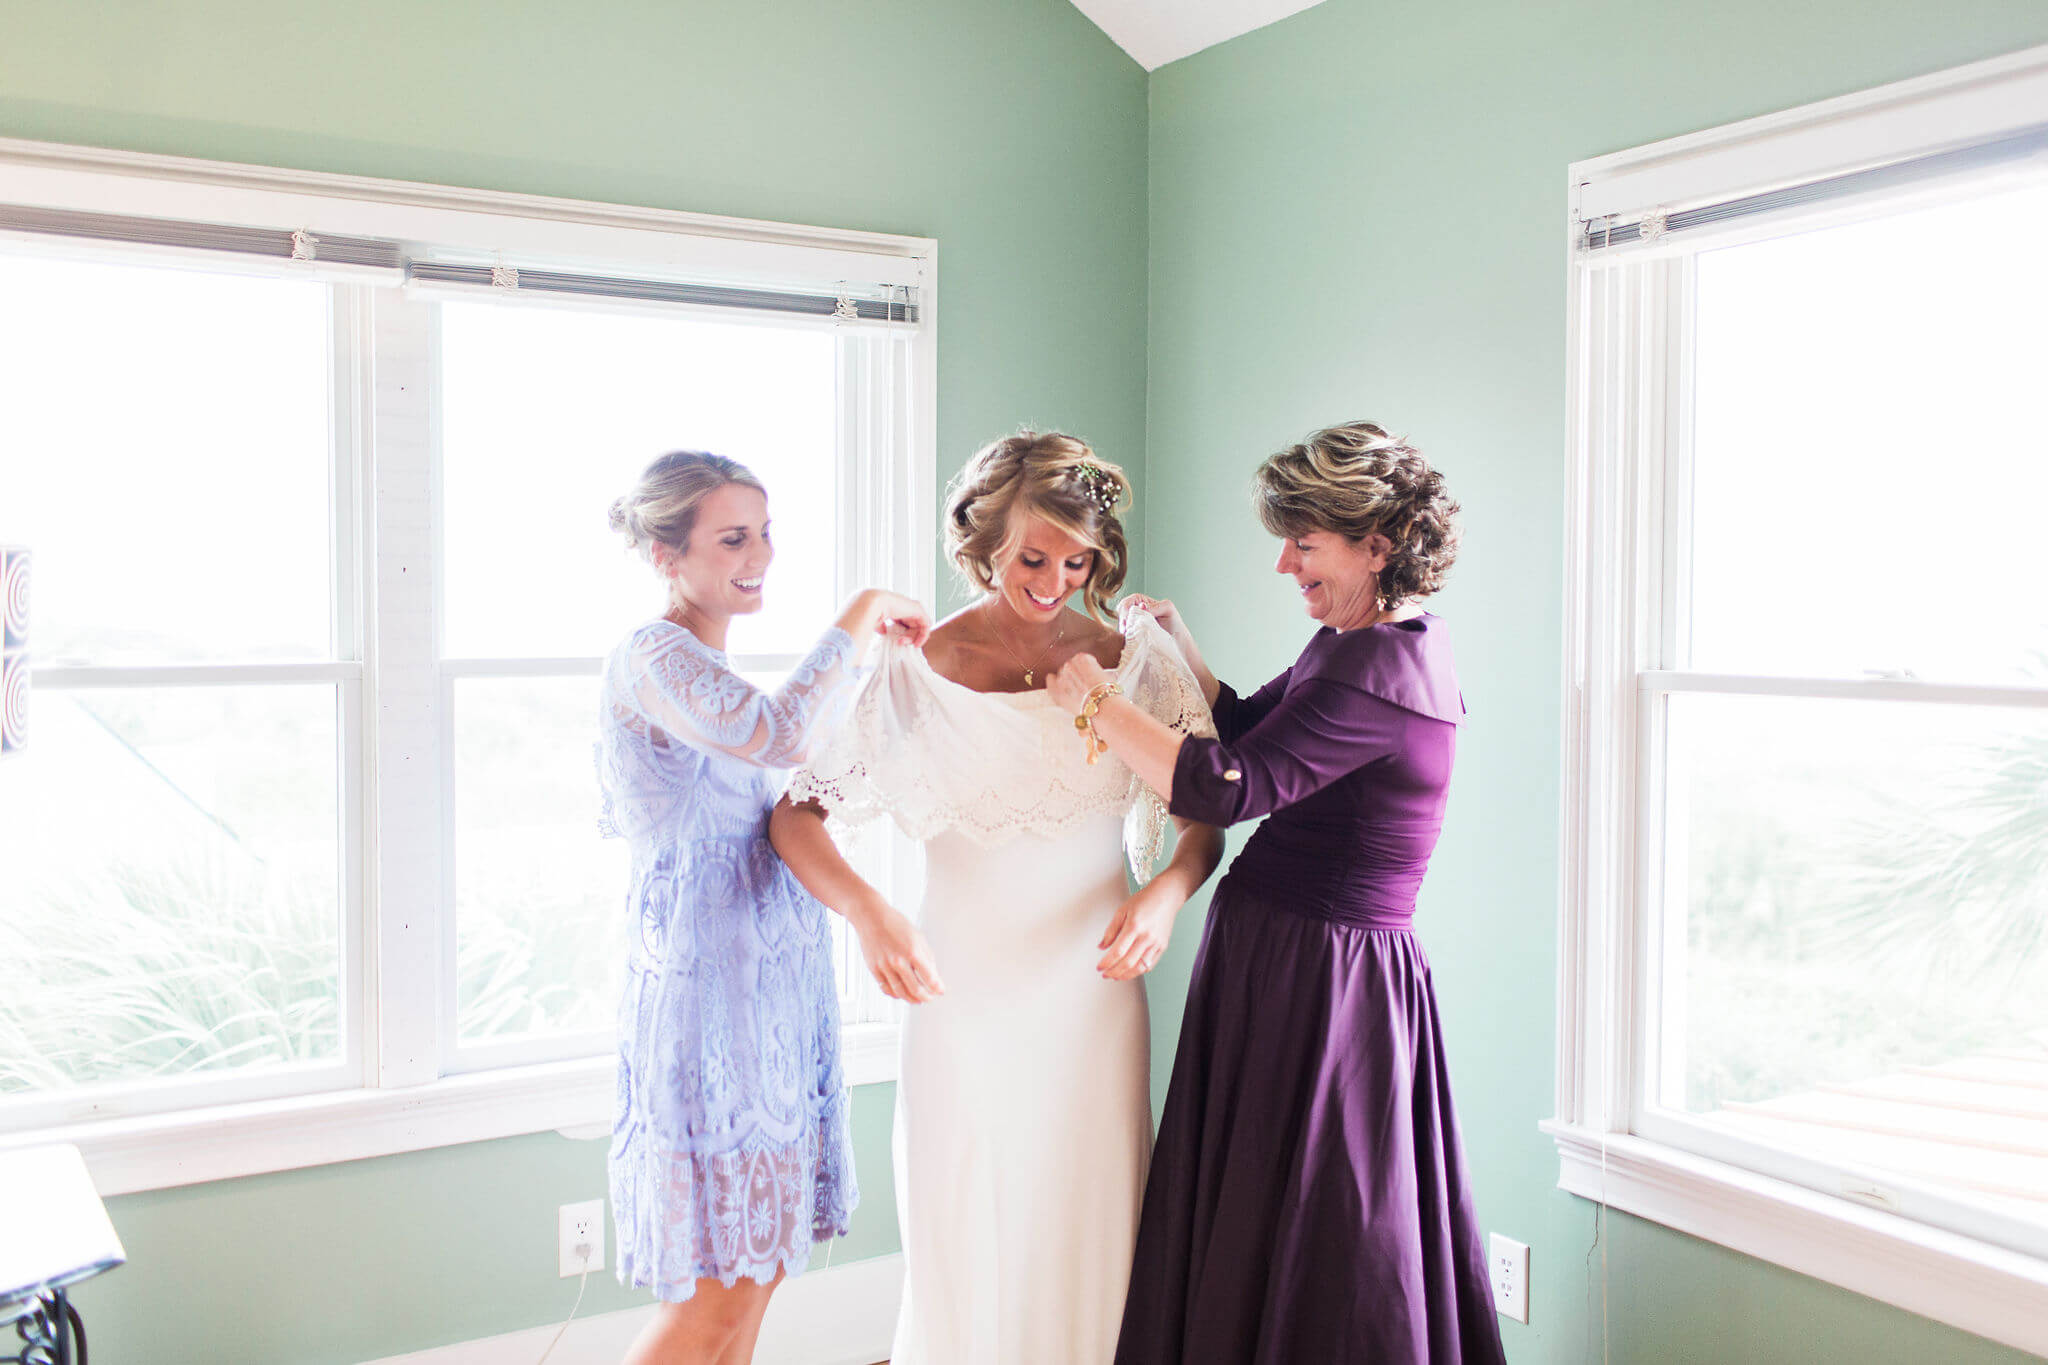 Apt-b-photography-savannah-wedding-photographer-savannah-tybee-island-wedding-134.JPG